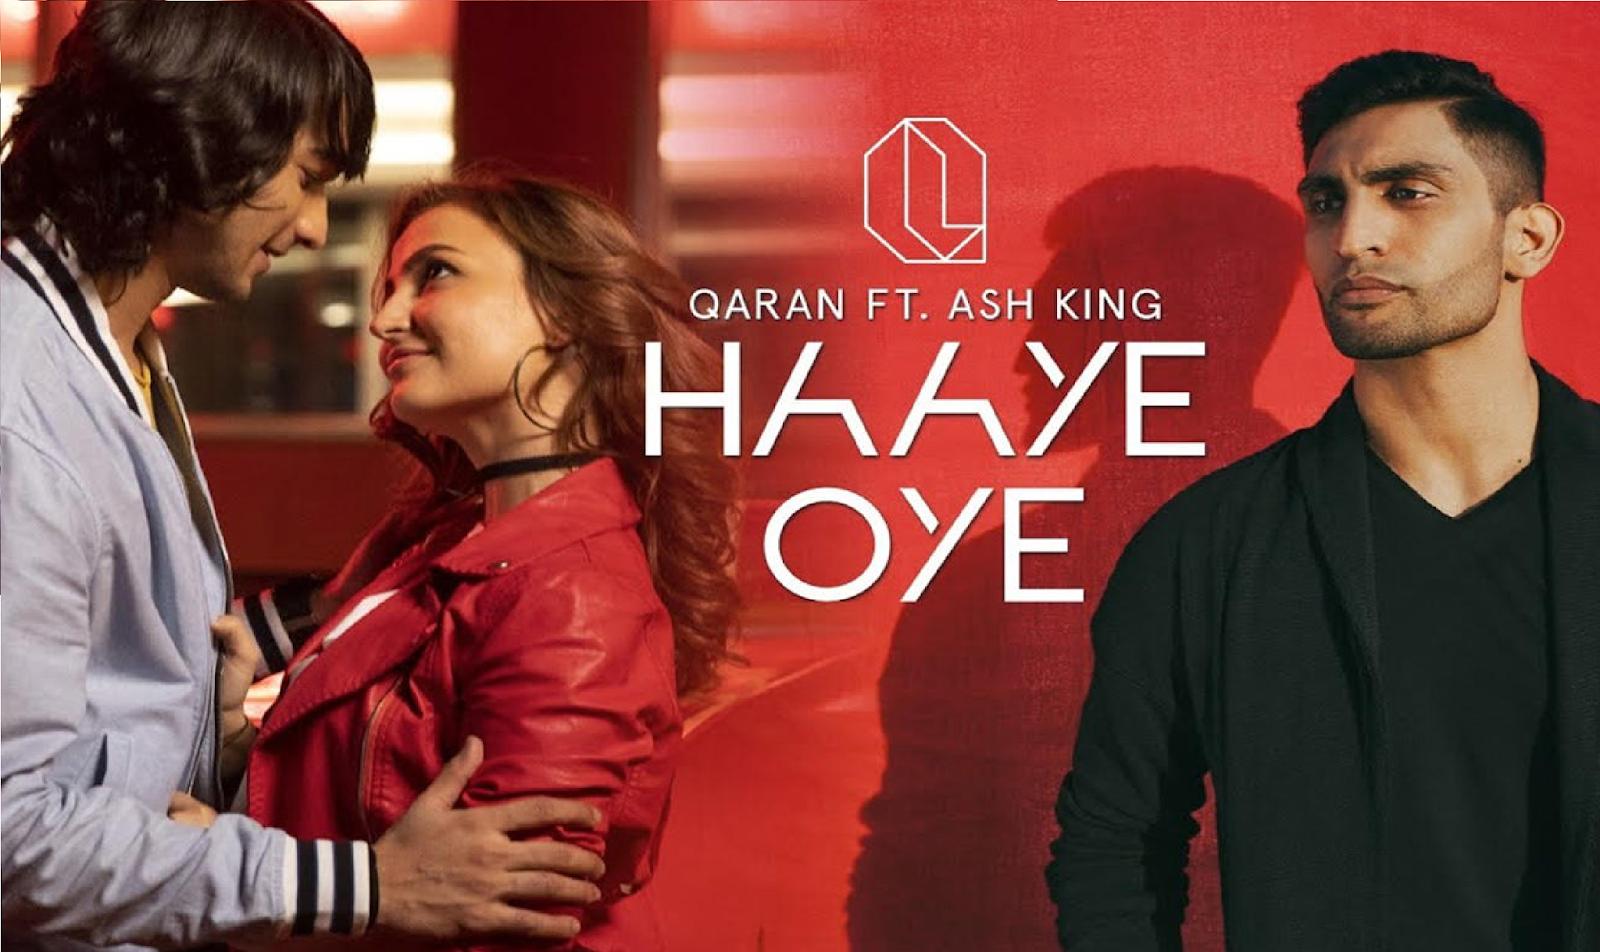 Haye Oye Guitar Chords Lyrics with Strumming Pattern | Qaran